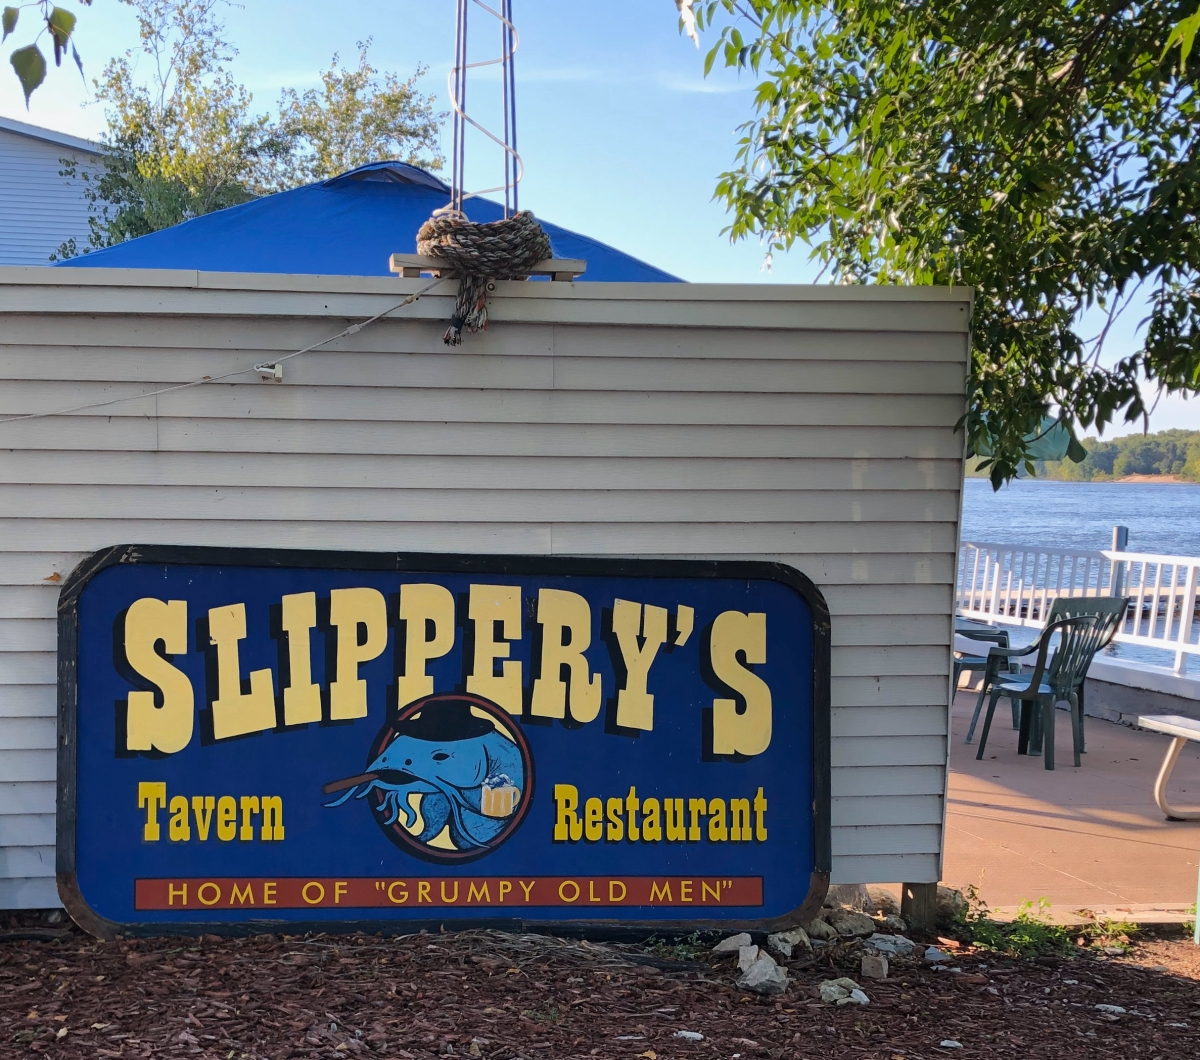 Slippery's Restaurant in Wabasha